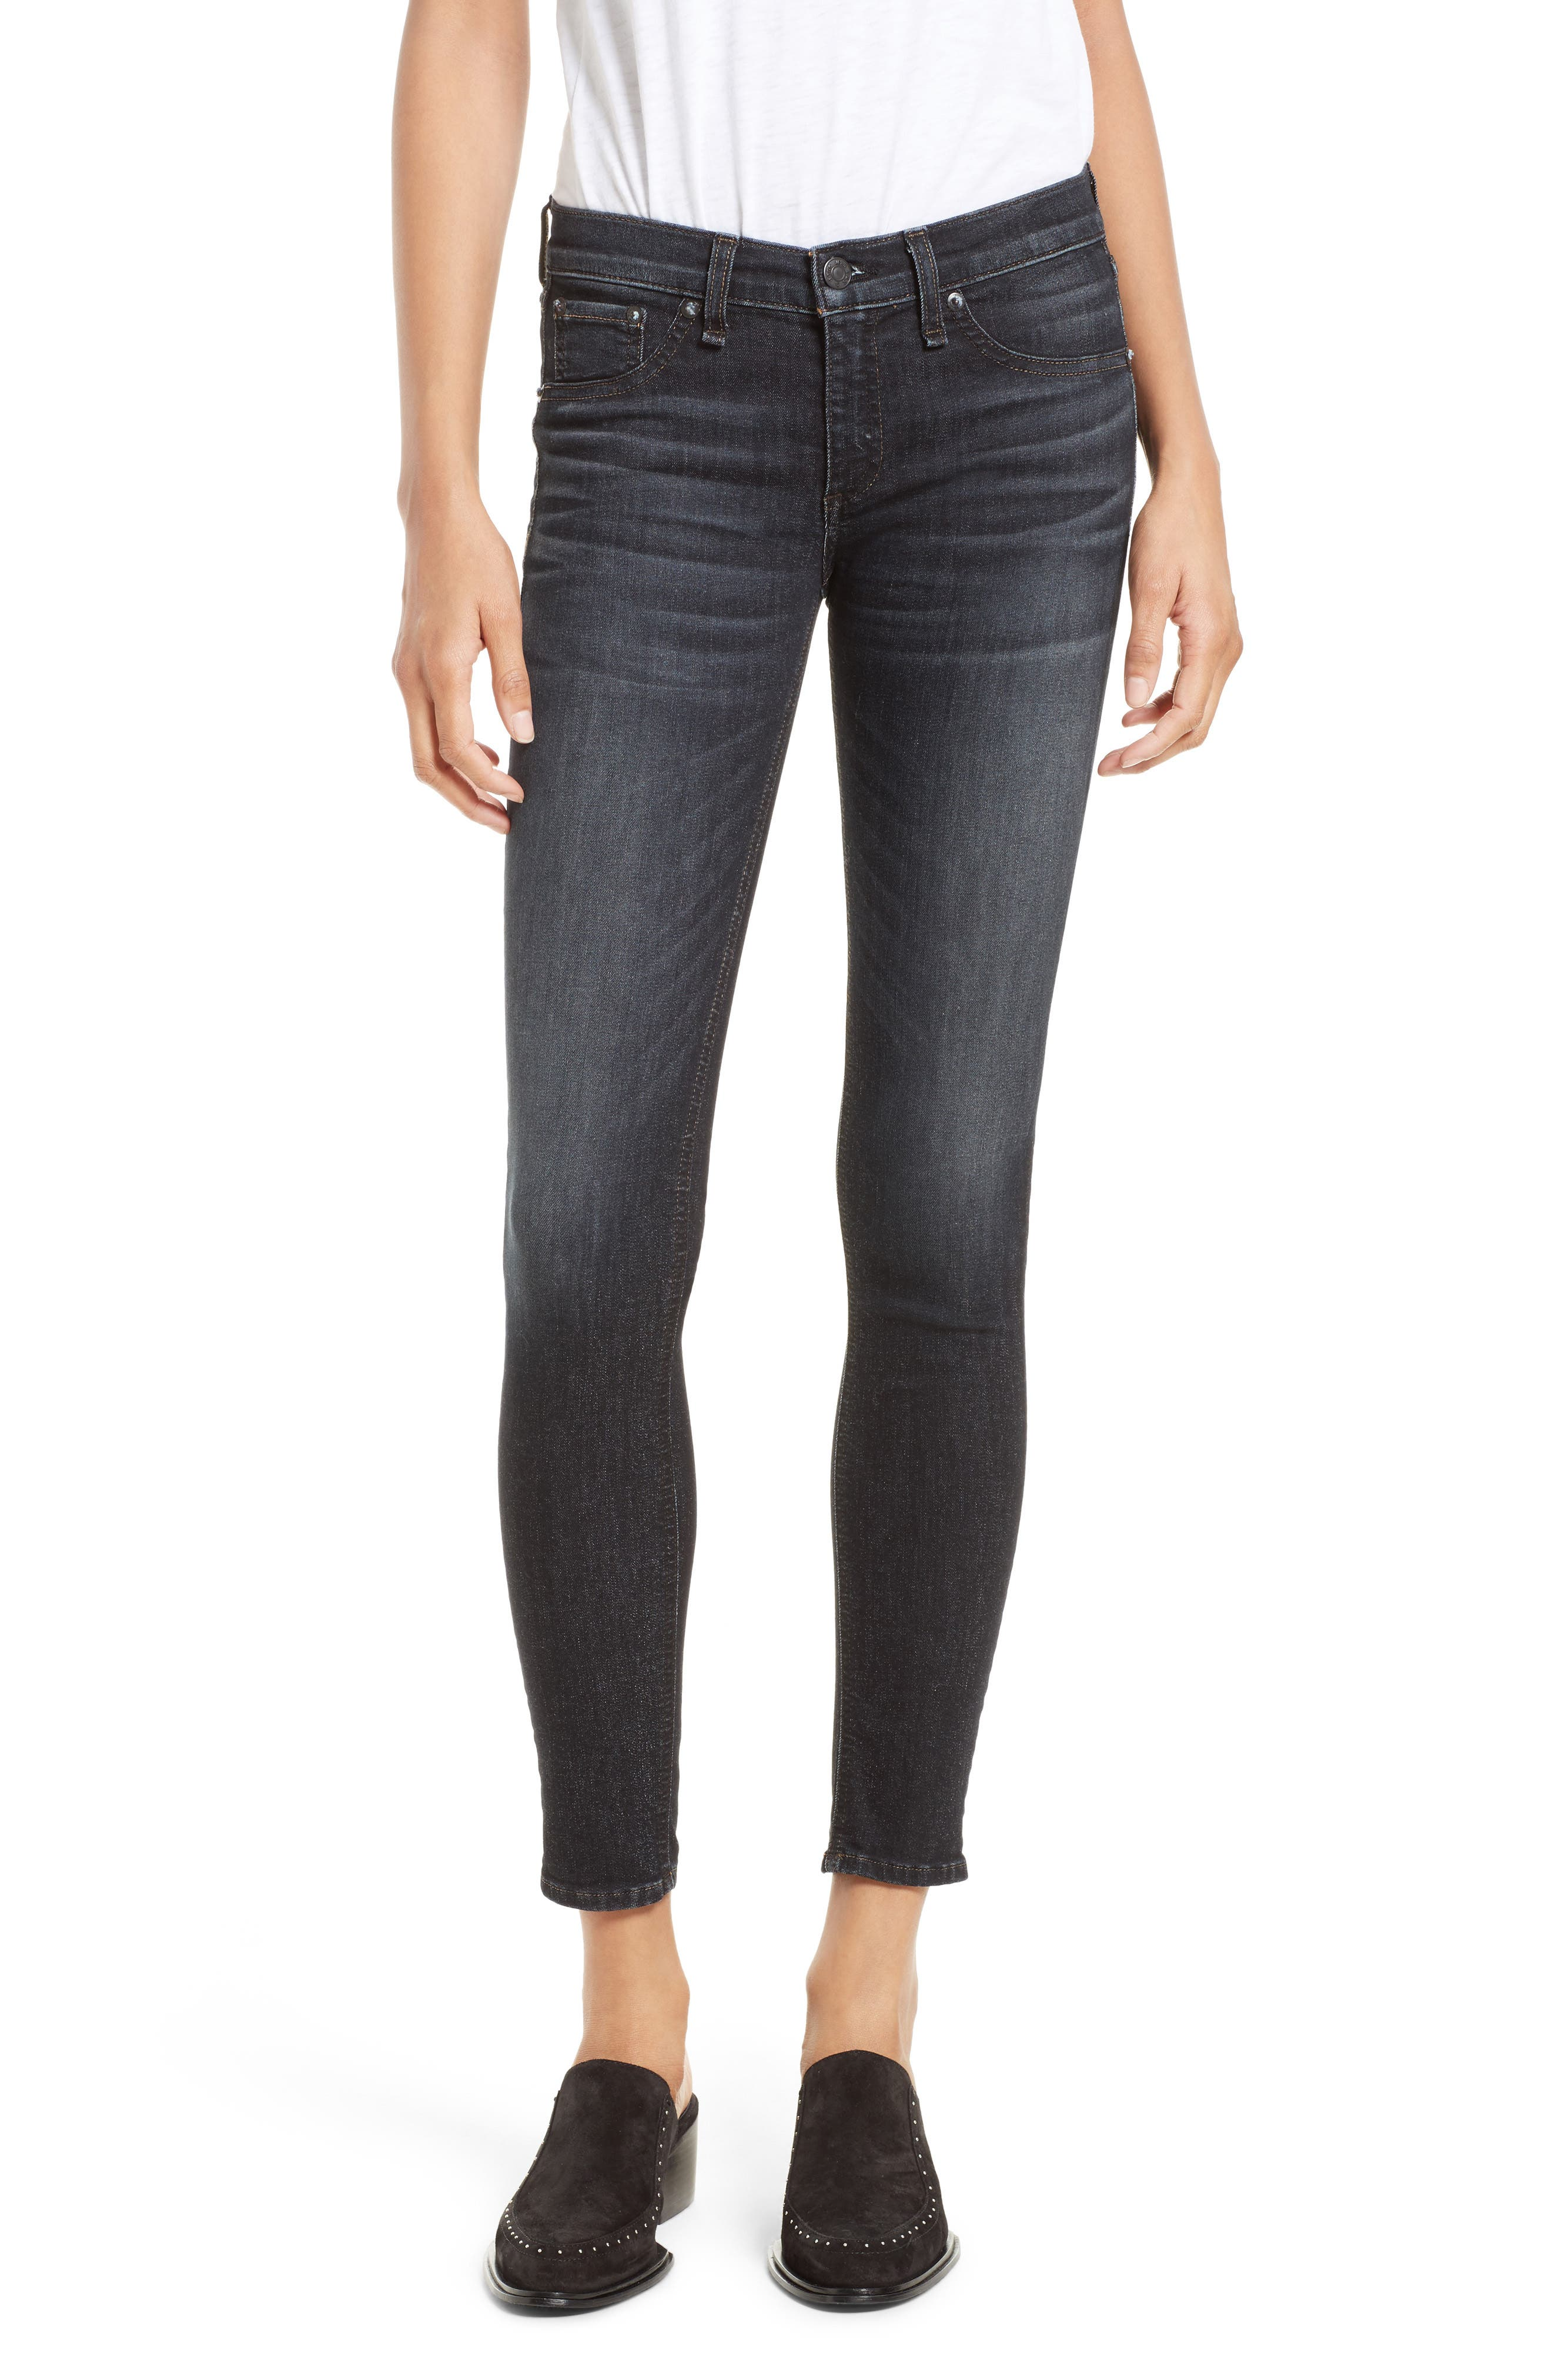 Alternate Image 1 Selected - rag & bone/JEAN Skinny Jeans (Black Rae)